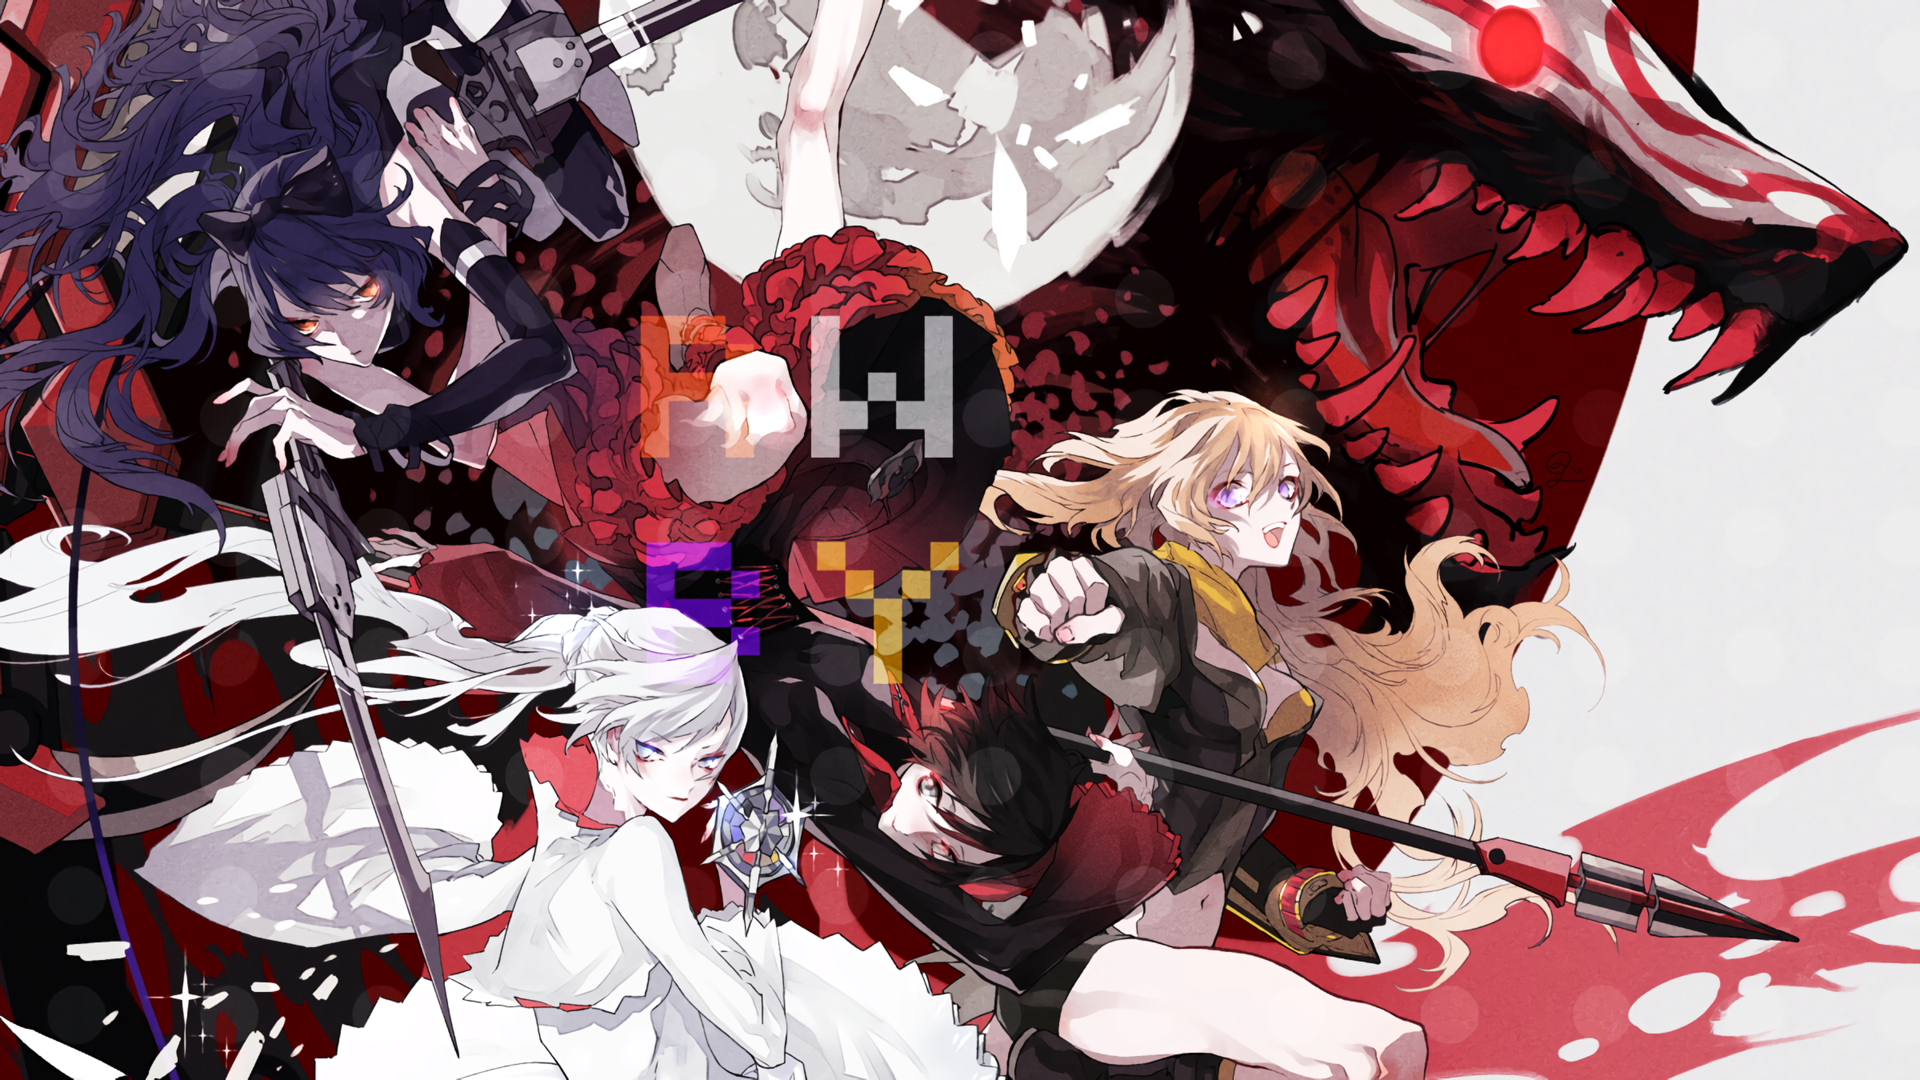 Anime-RWBY-Ruby-Rose-RWBY-Weiss-Schnee-Blake-Belladonna-Yang-Xiao-Long-wallpaper-wpc5802156